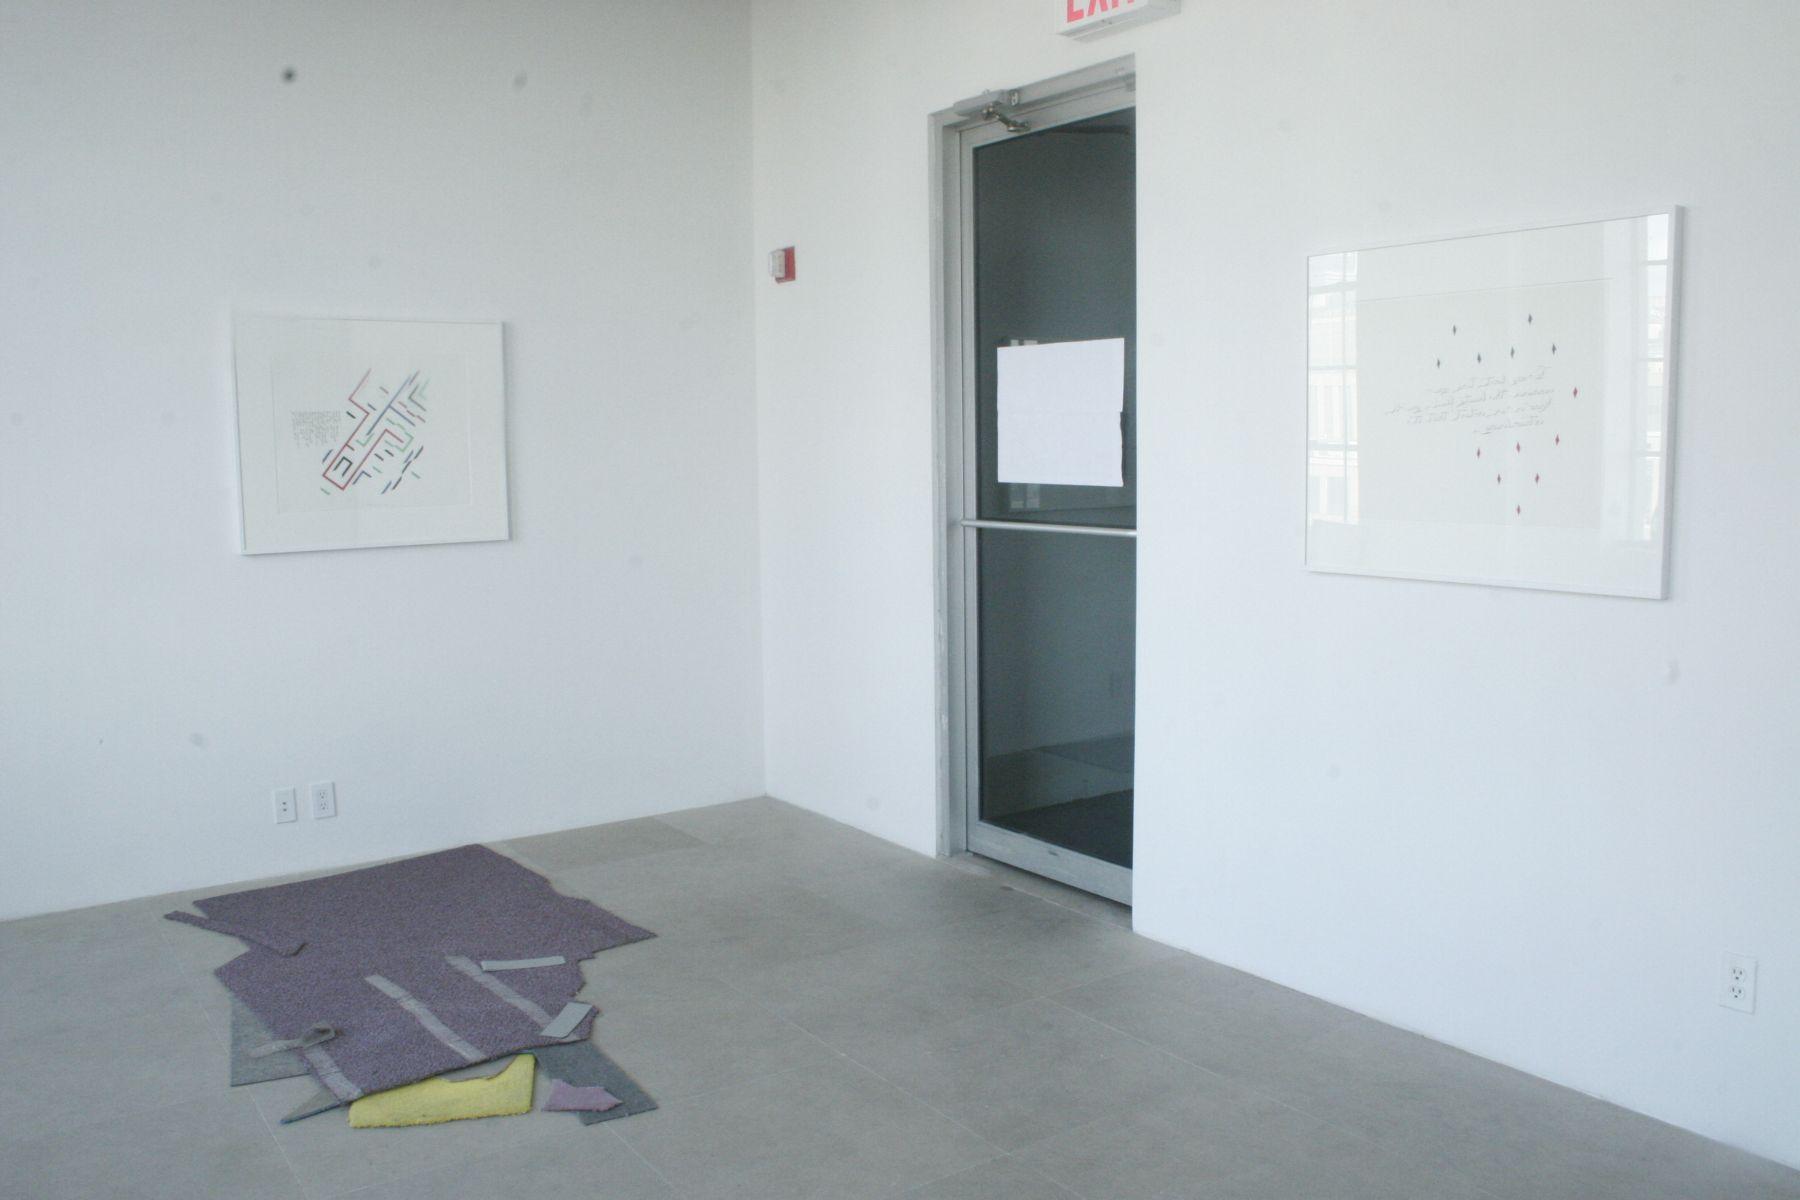 Installation view, Genesis I'm Sorry, Greene Naftali, New York, 2007